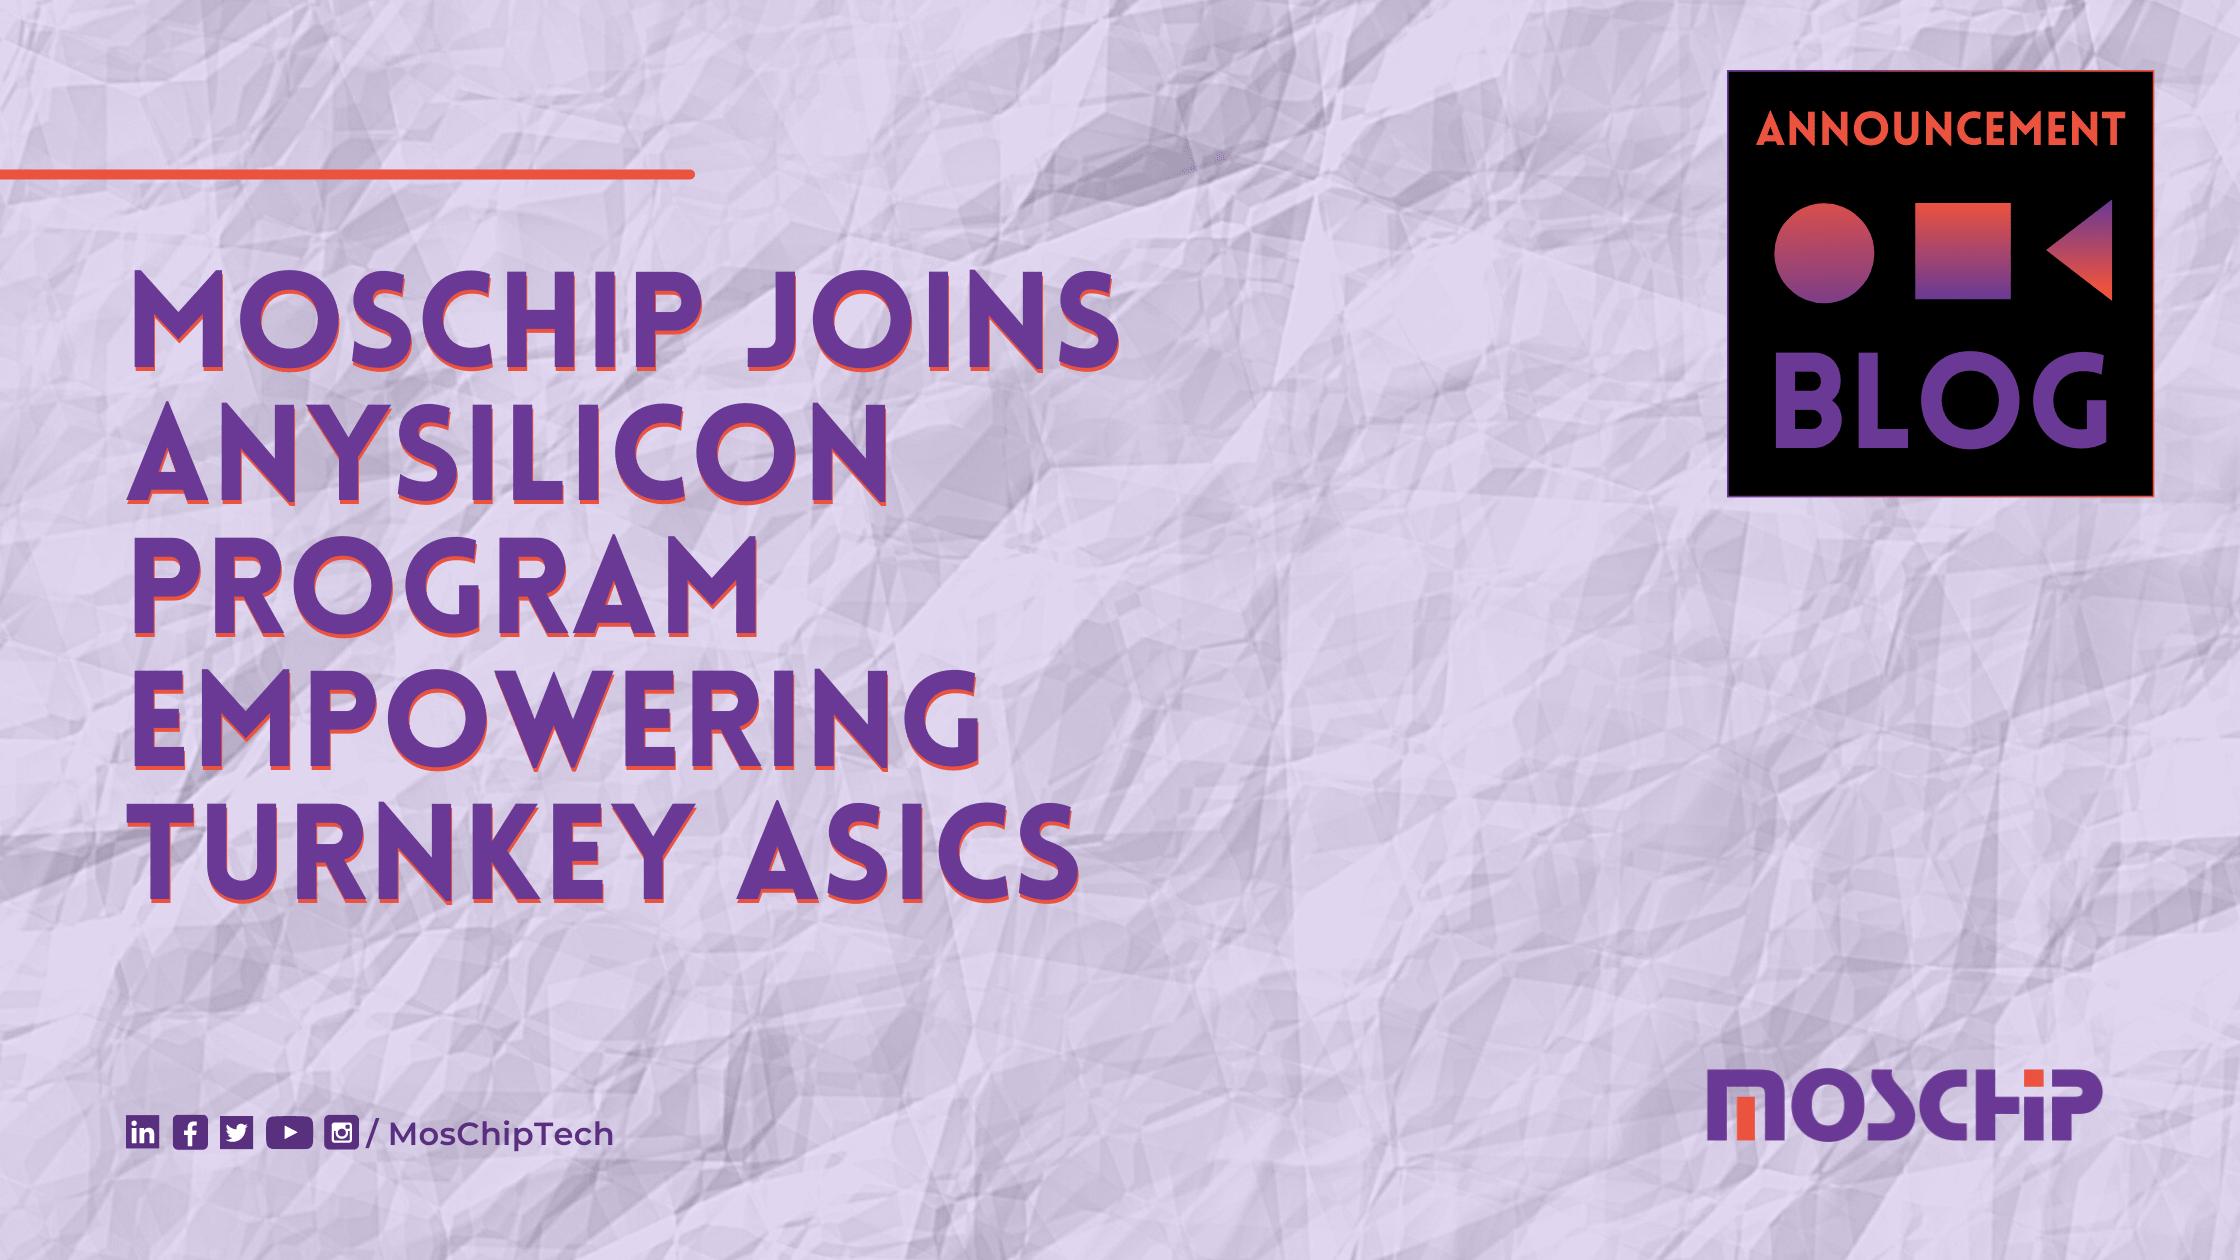 MosChip Joins AnySilicon Program Empowering Turnkey ASICs_Blog